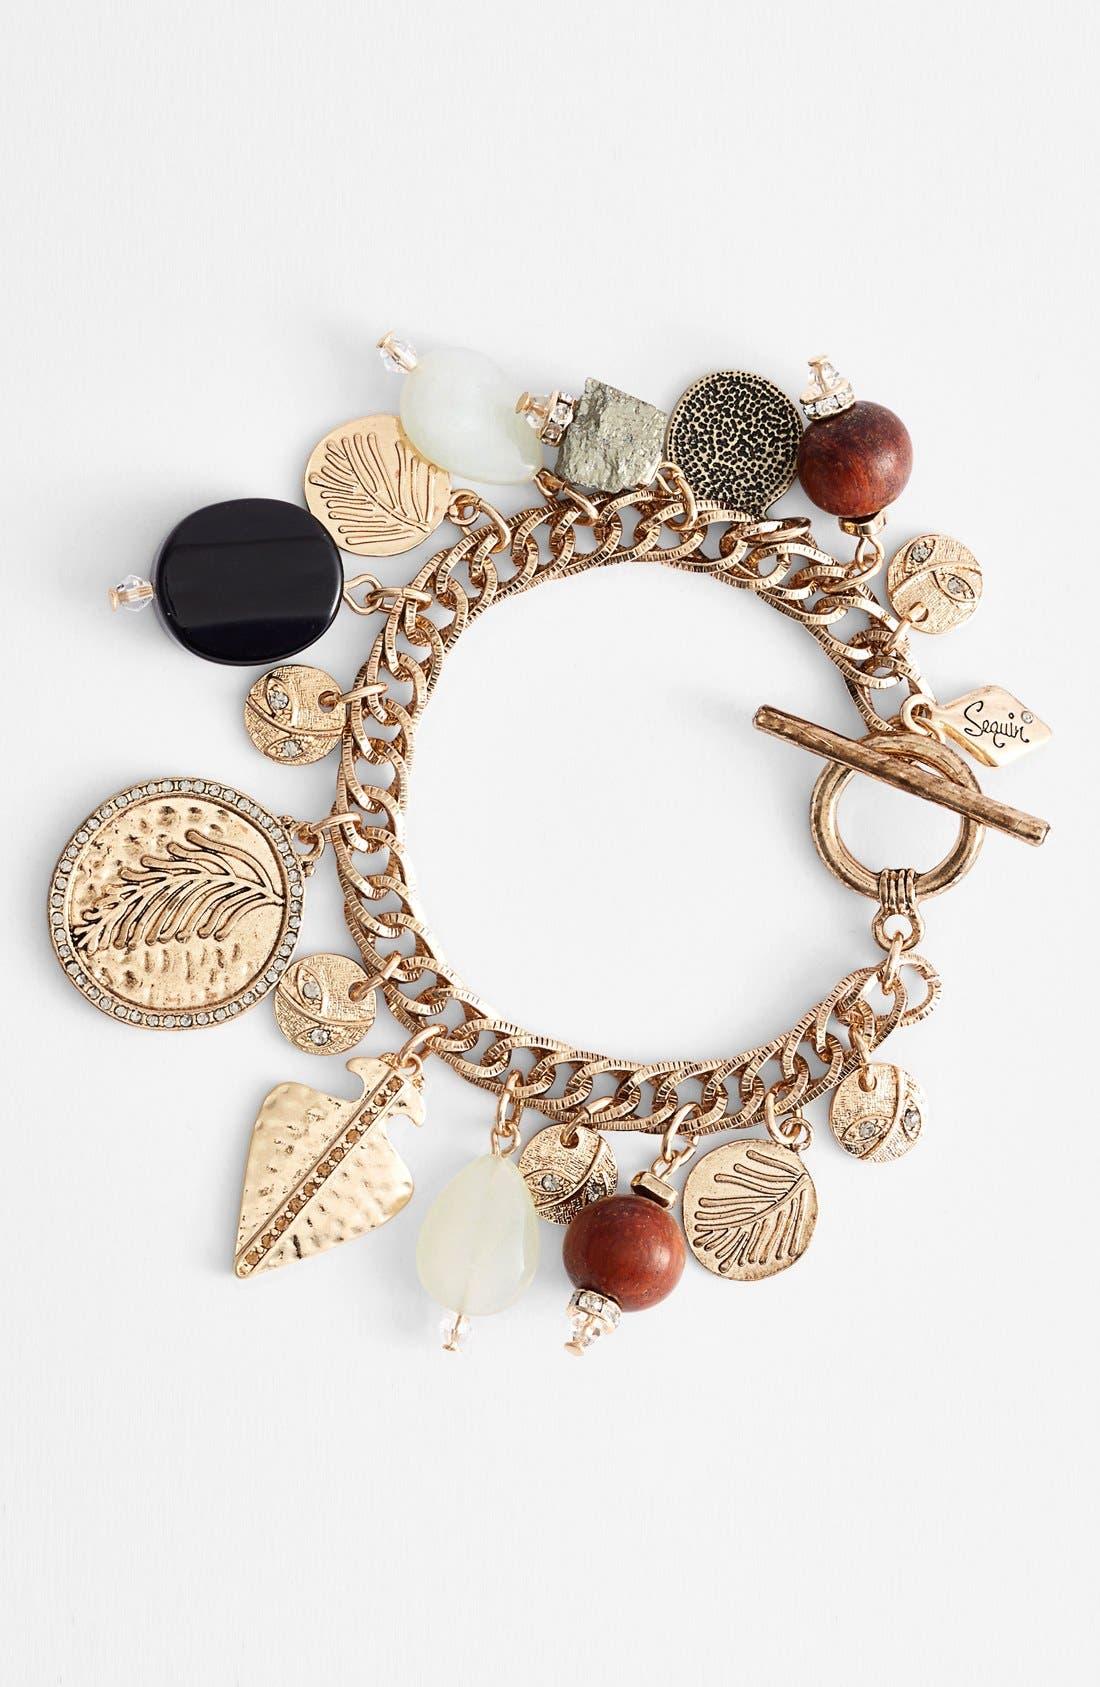 Main Image - Sequin 'Sealife' Charm Bracelet